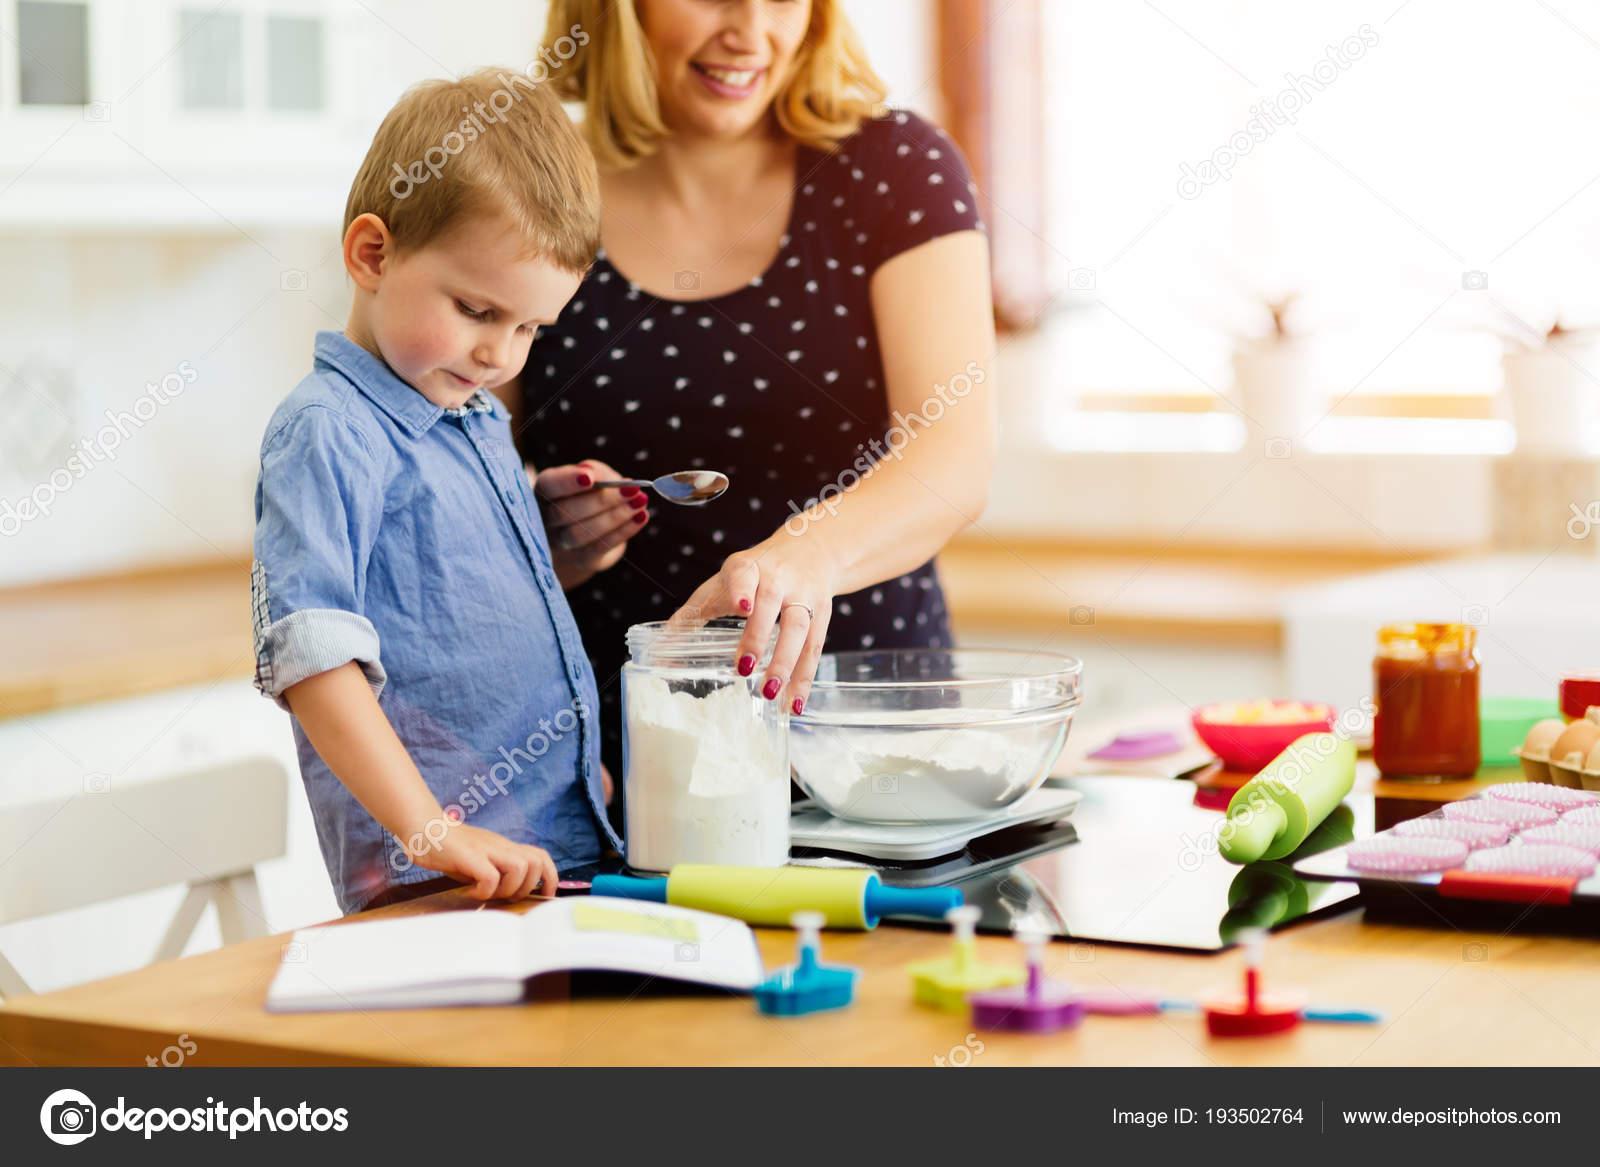 macys kitchen aid hotels with kitchens in las vegas 帮助准备松饼在厨房的妈妈的孩子 图库照片 c nd3000 193502764